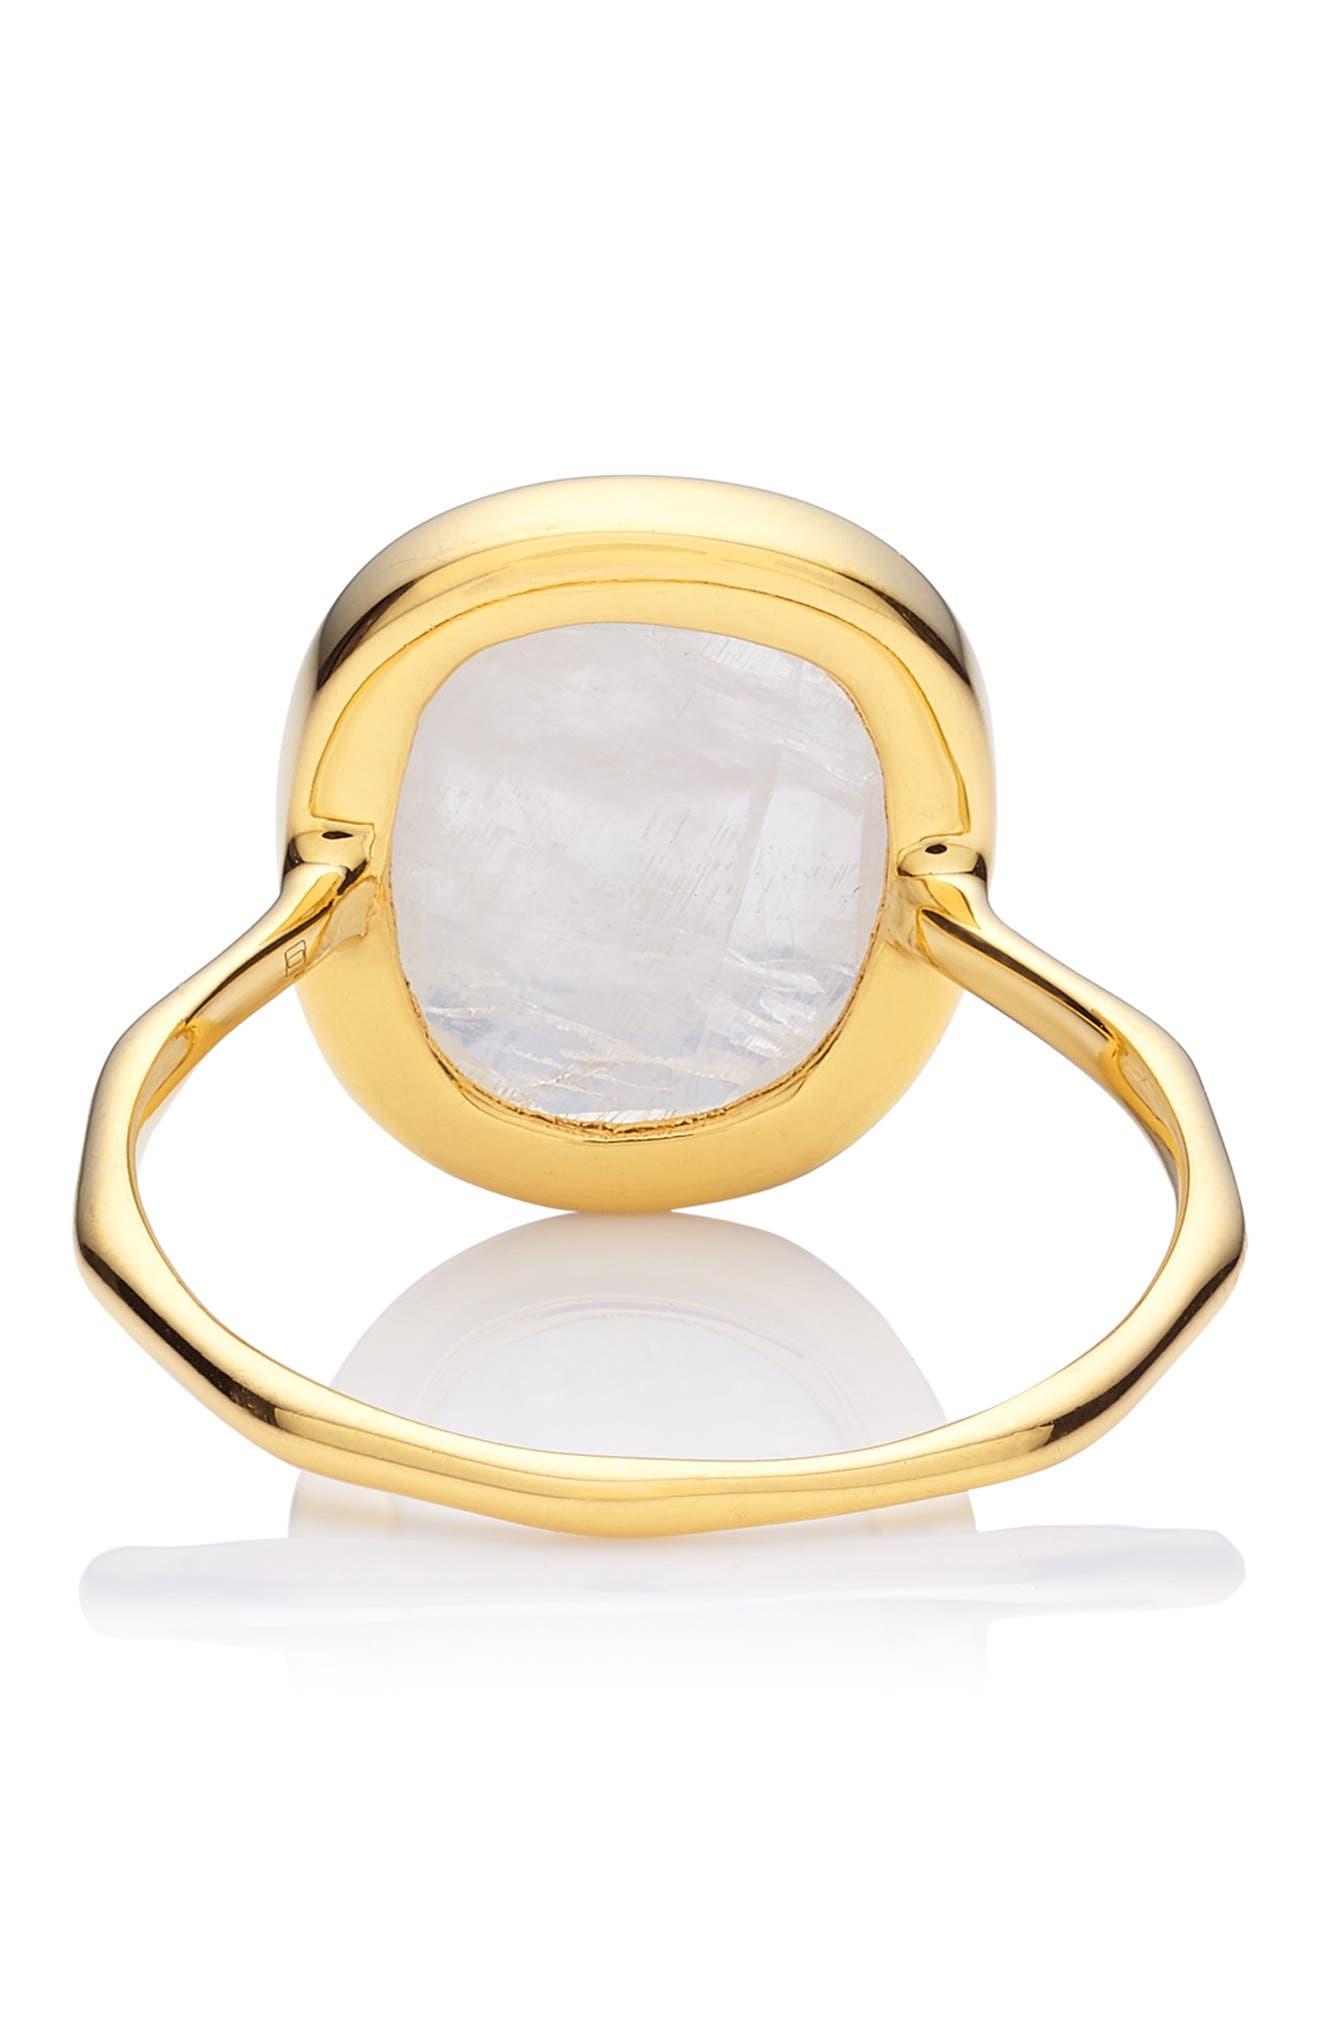 MONICA VINADER, Siren Semiprecious Stone Ring, Alternate thumbnail 3, color, GOLD/ MOONSTONE